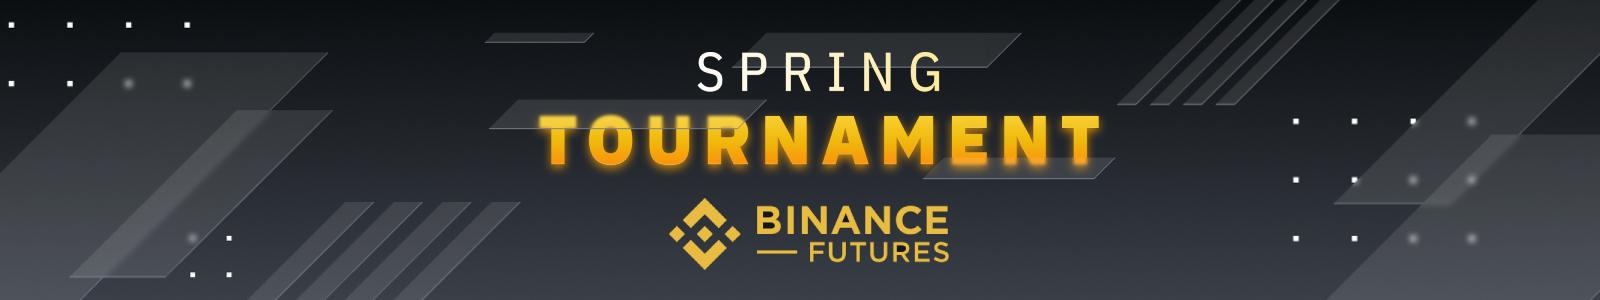 Binance Futures Spring Tournament